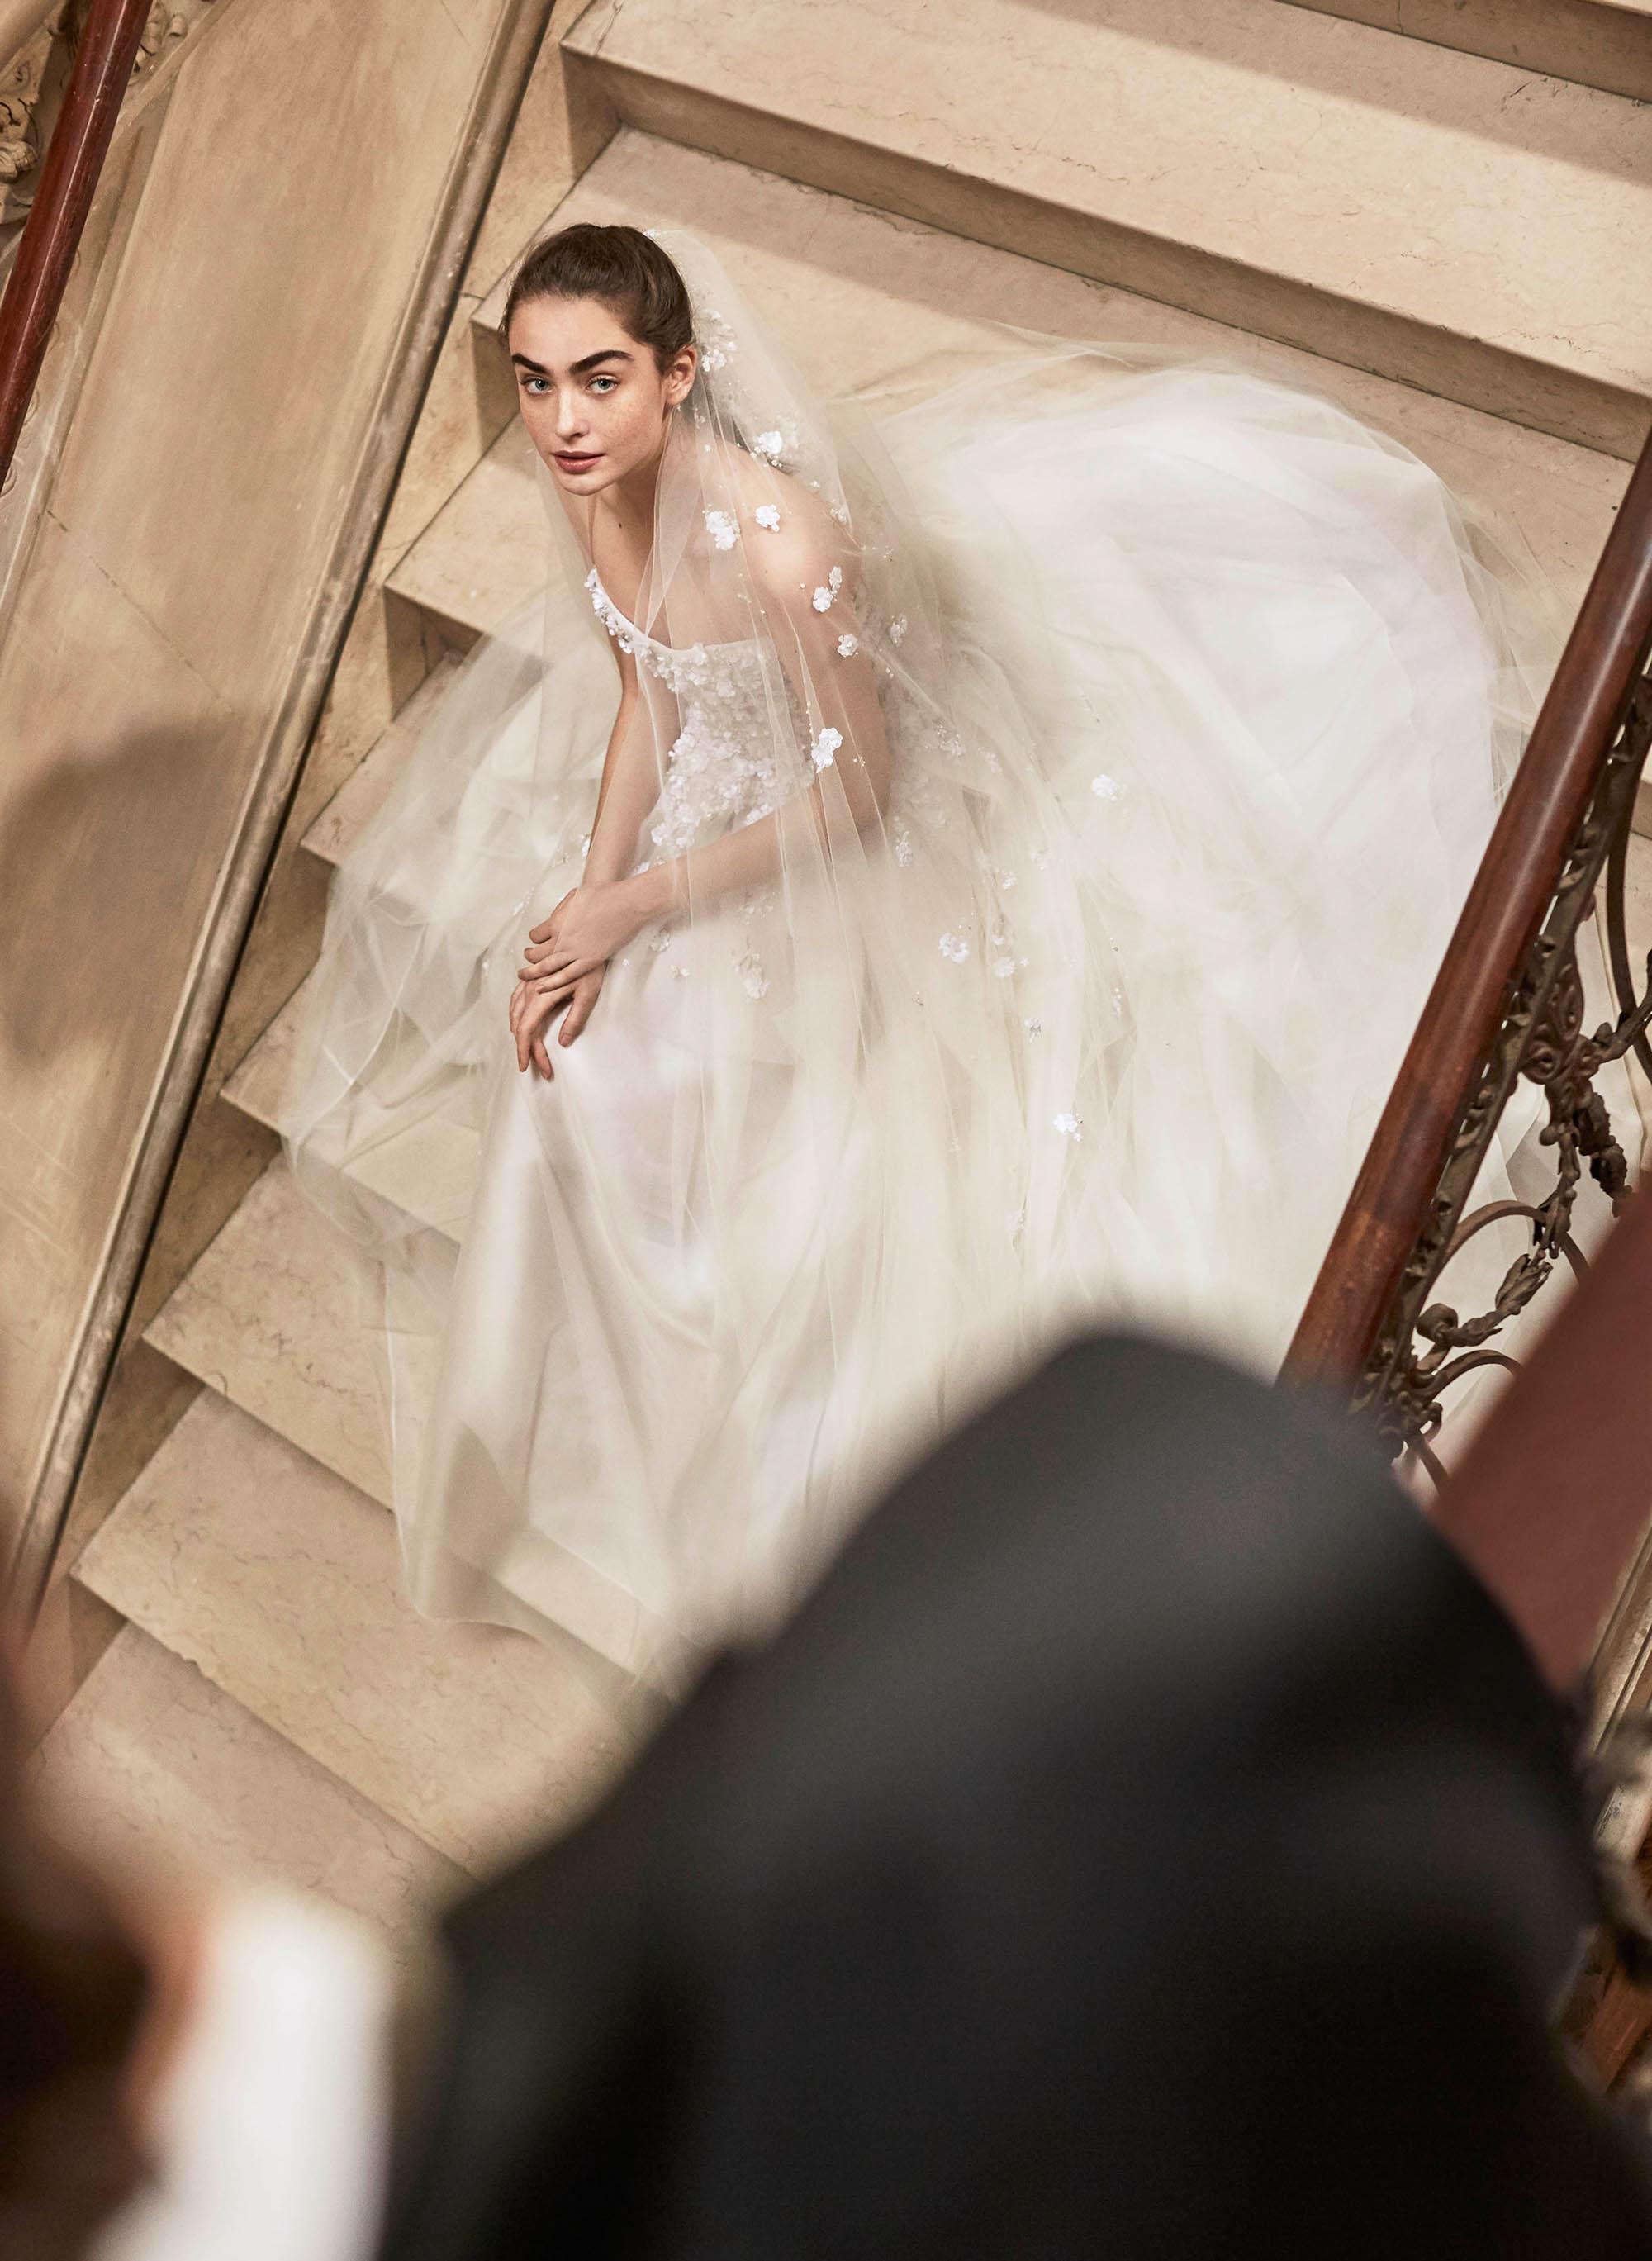 Carolina Herrera wedding dress spring 2019 strapless ballgown floral applique